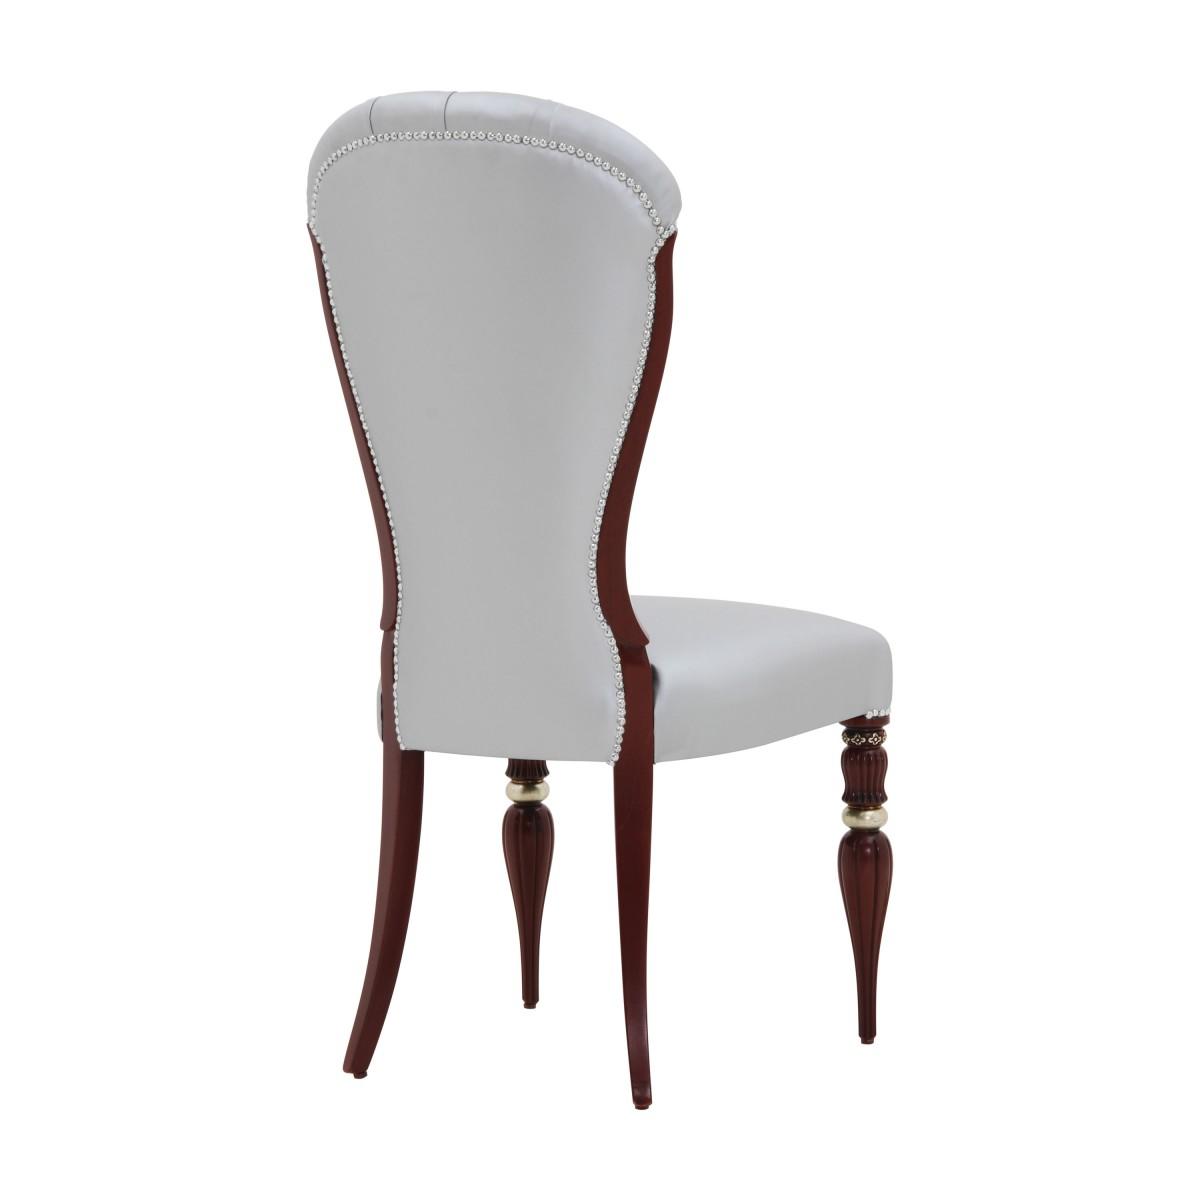 replica chair adele 1 843